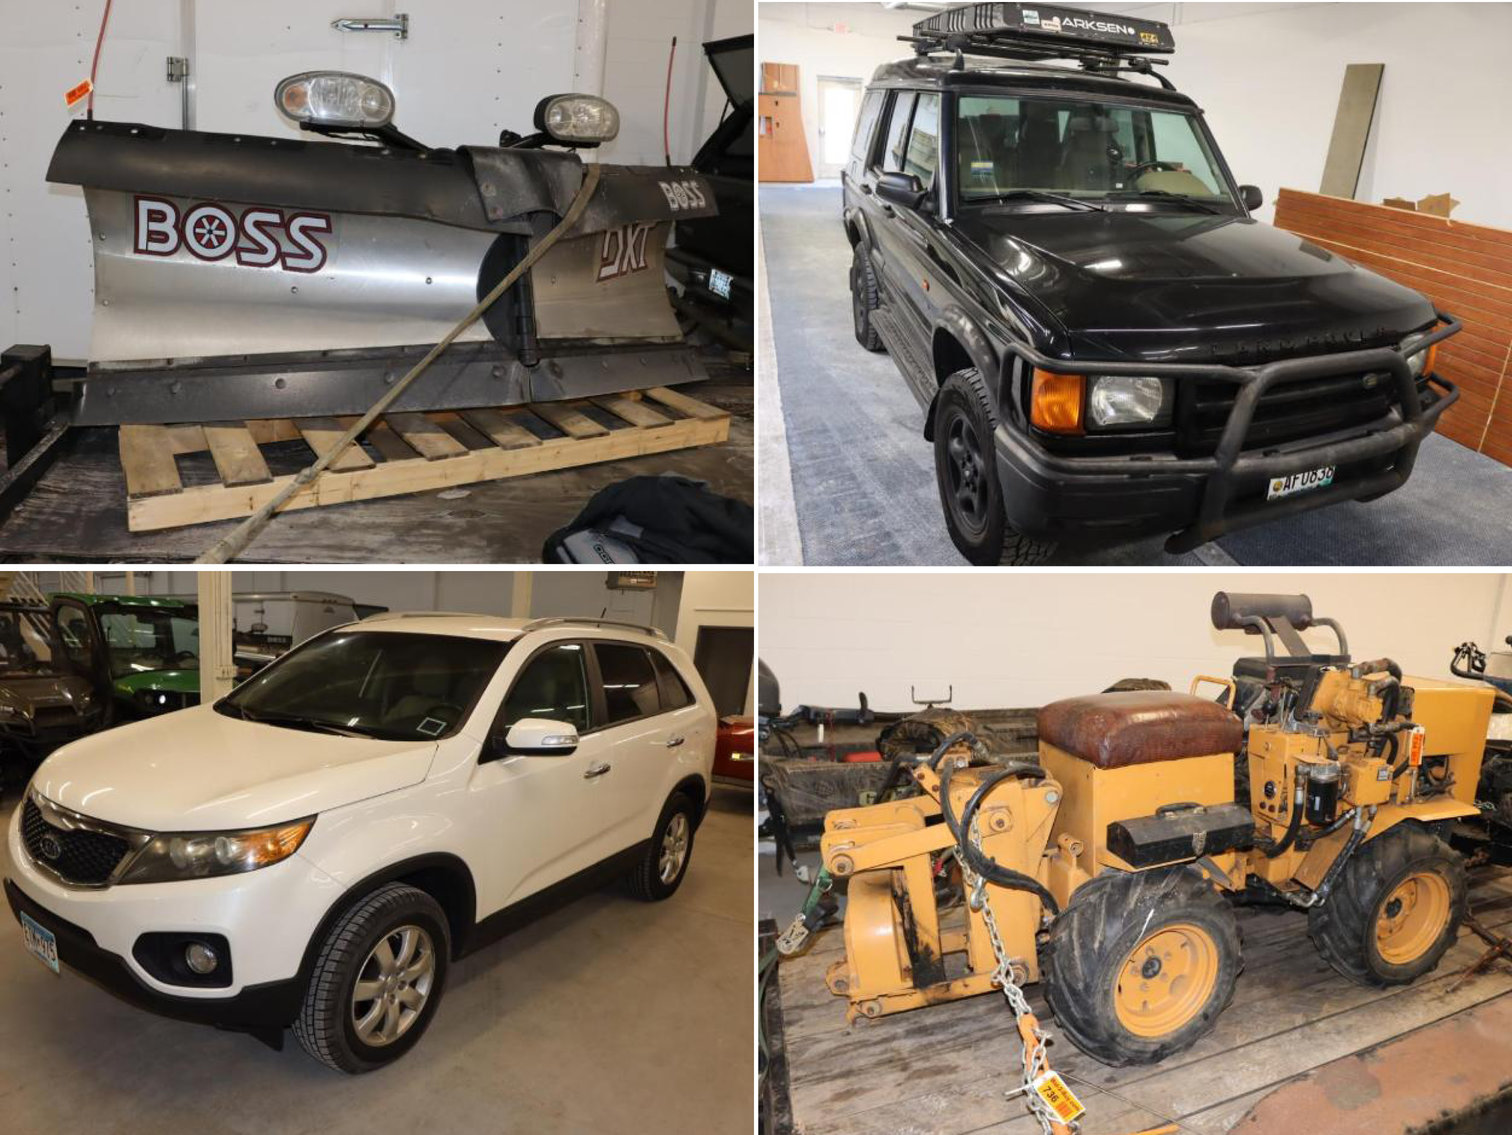 2012 Kia Sorento FWD, Stainless Steel V-Plow, 2002 Land Rover Discovery SE, Davis Line Layer Machine, Insulation Blowing Machine